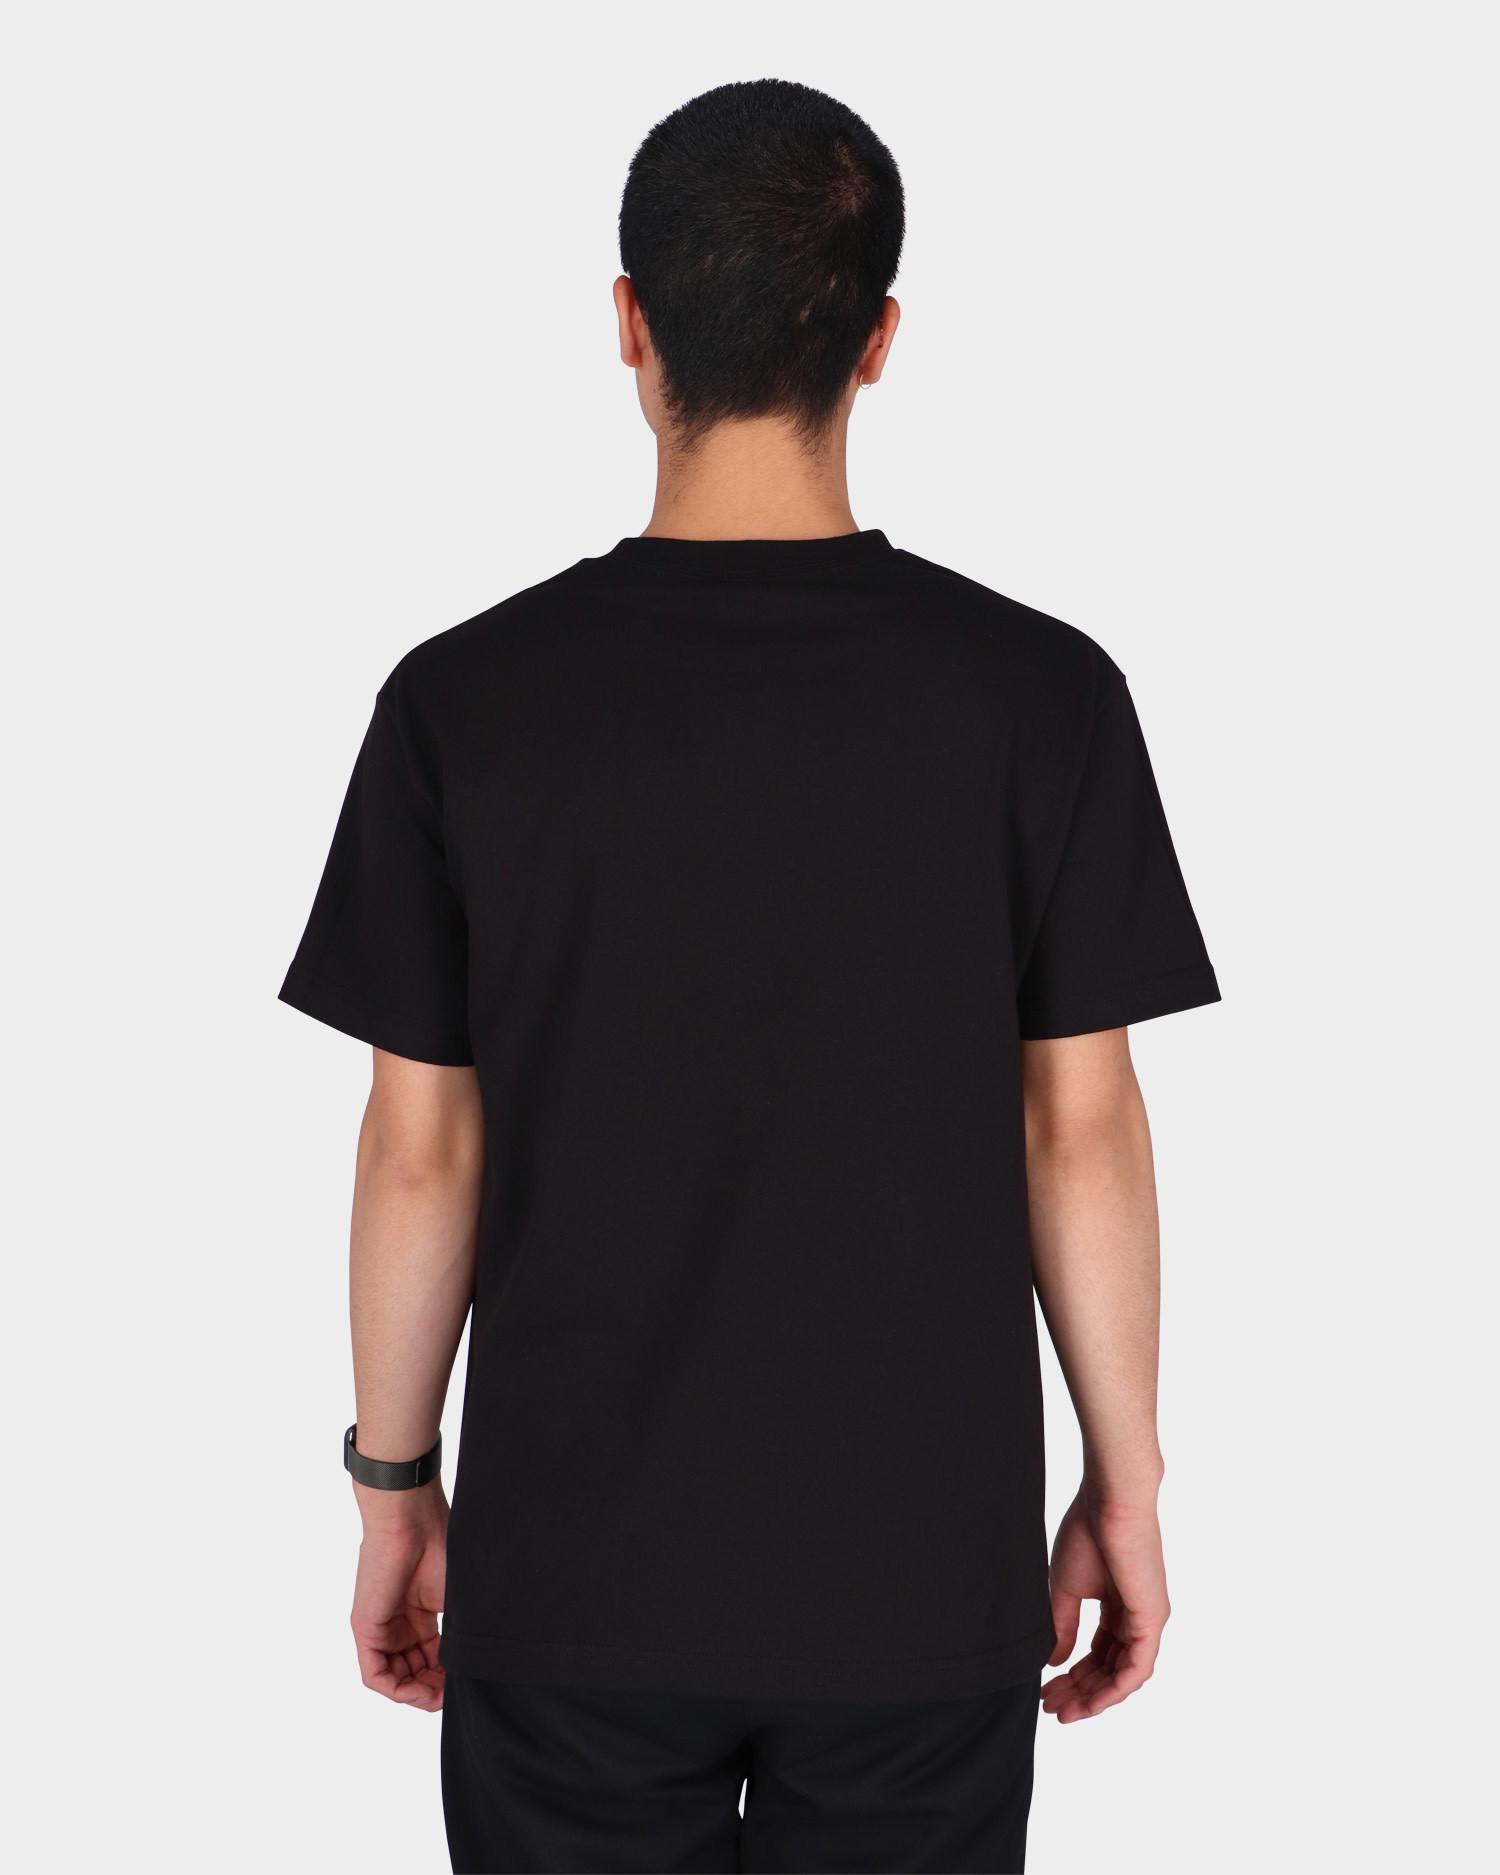 Quasi Skateboards Fossil Black T-Shirt